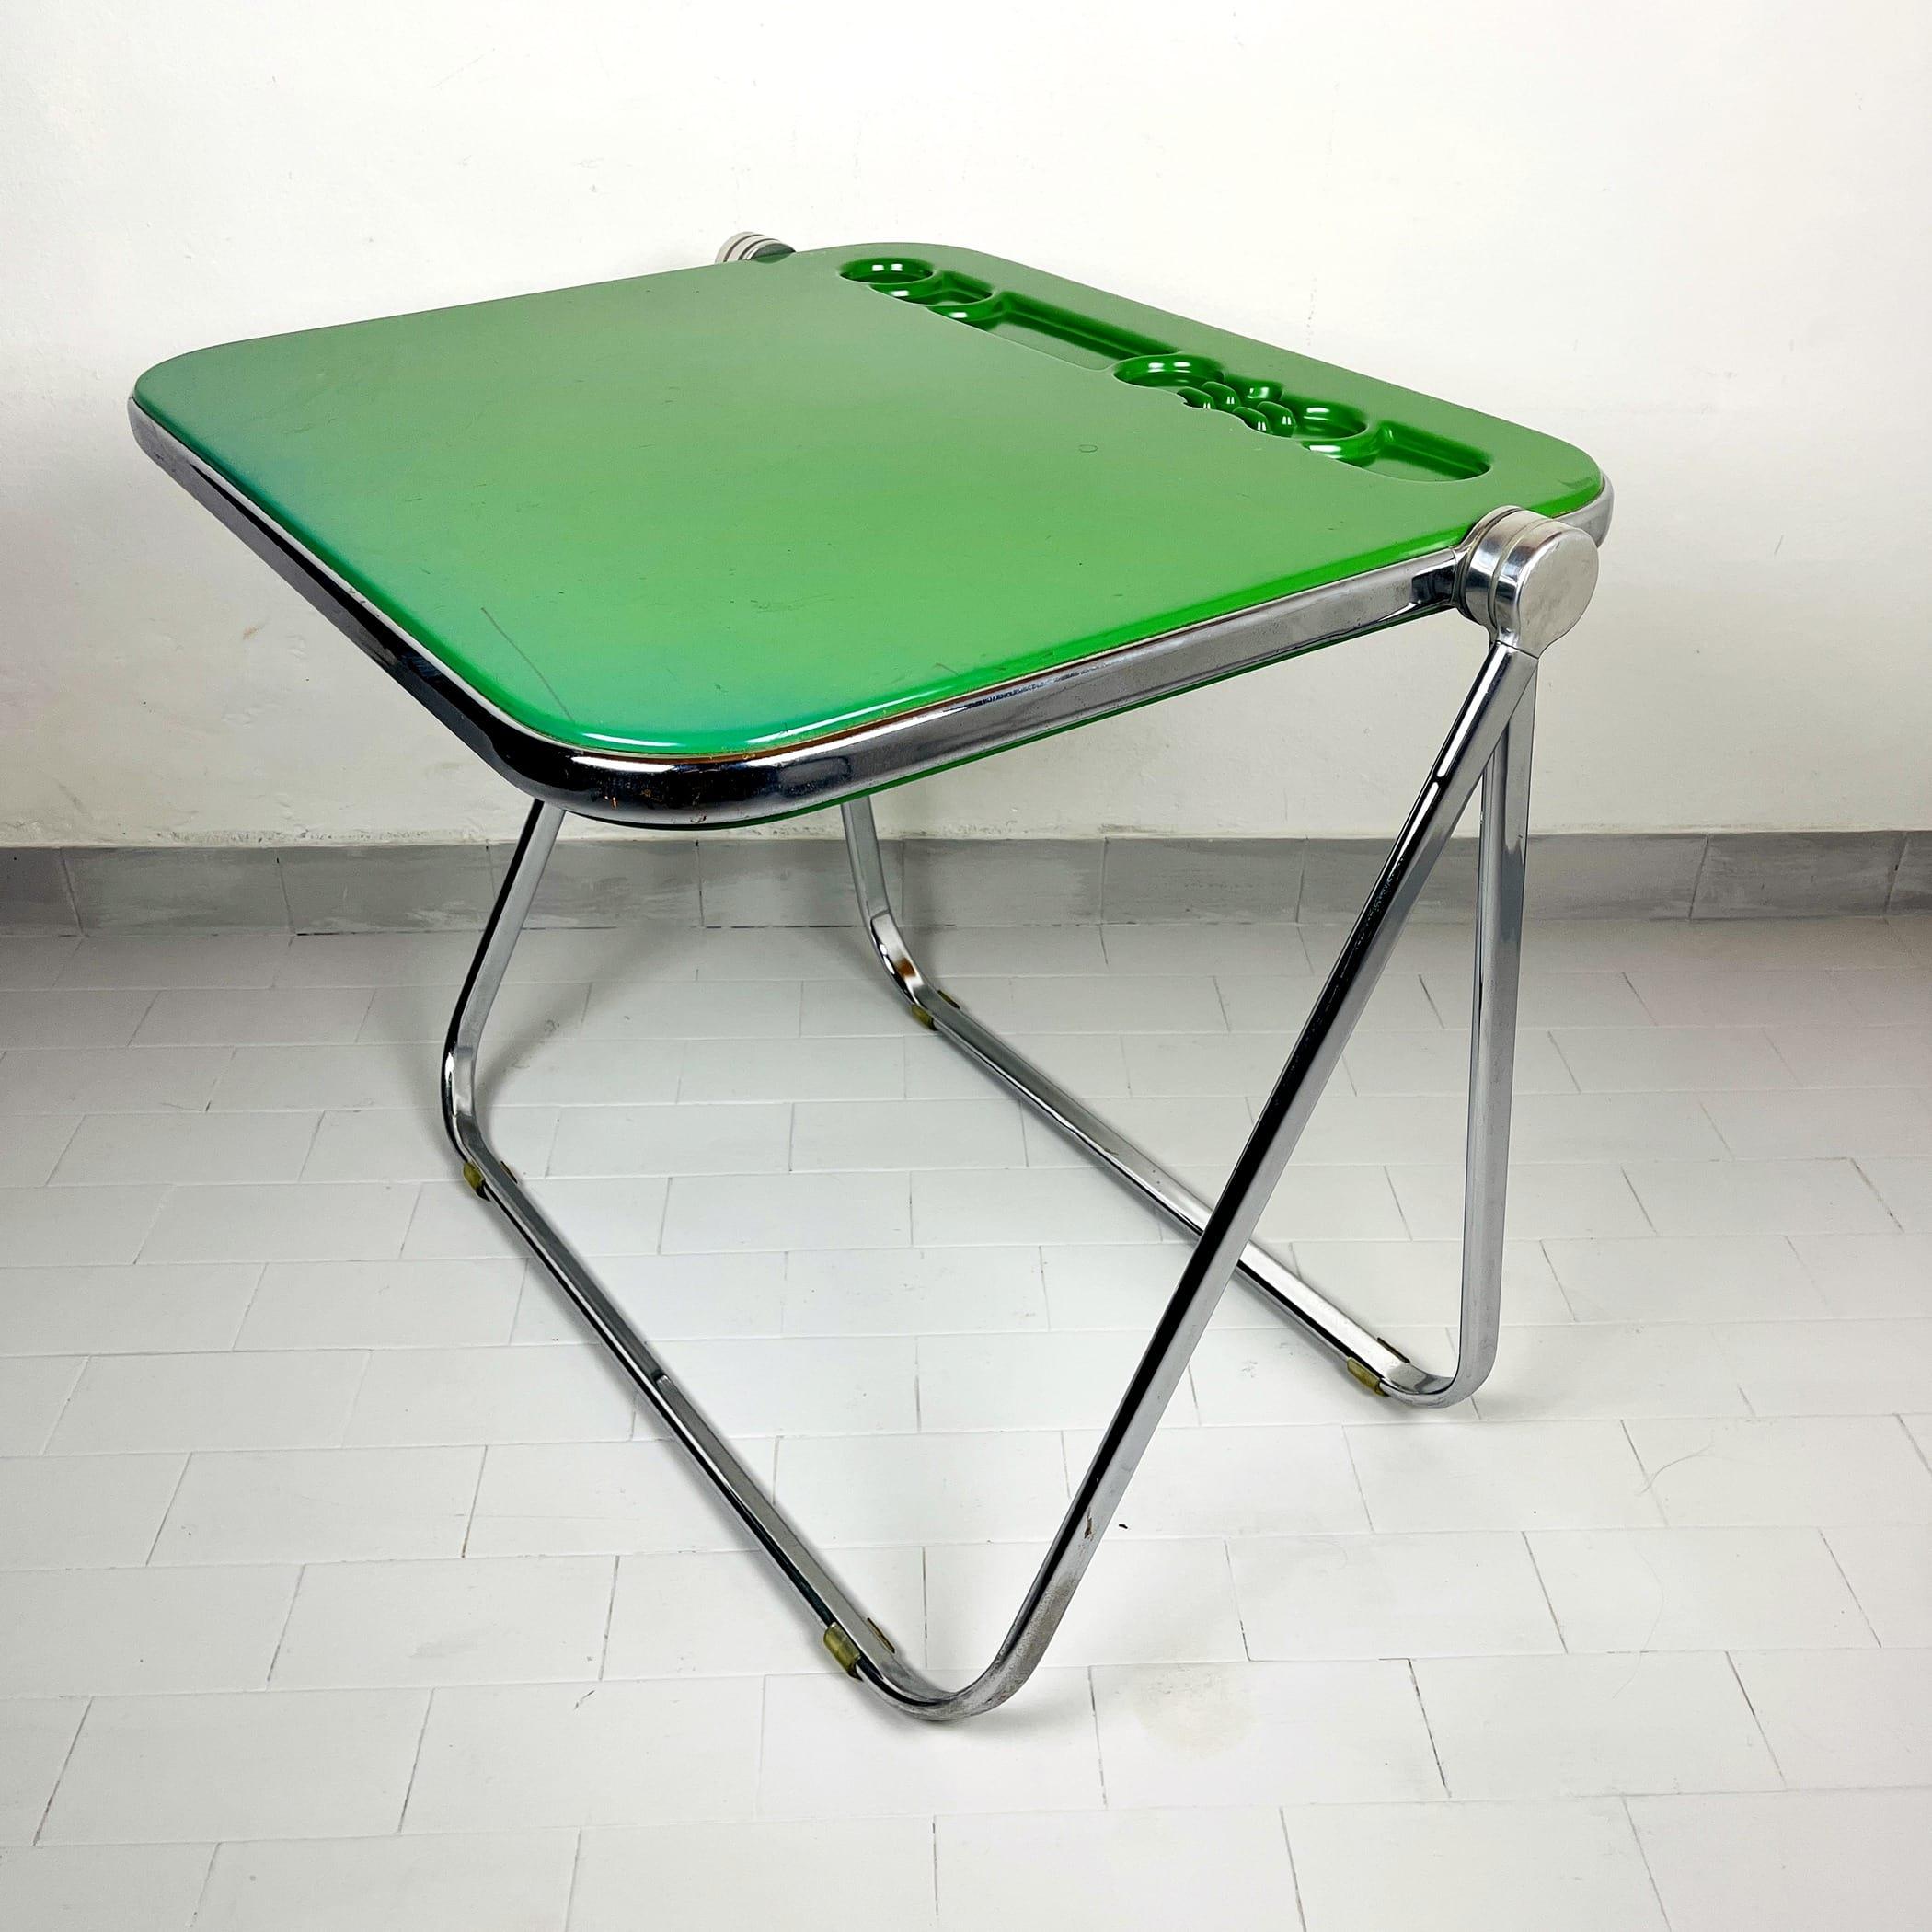 Platone folding table by Giancarlo Piretti